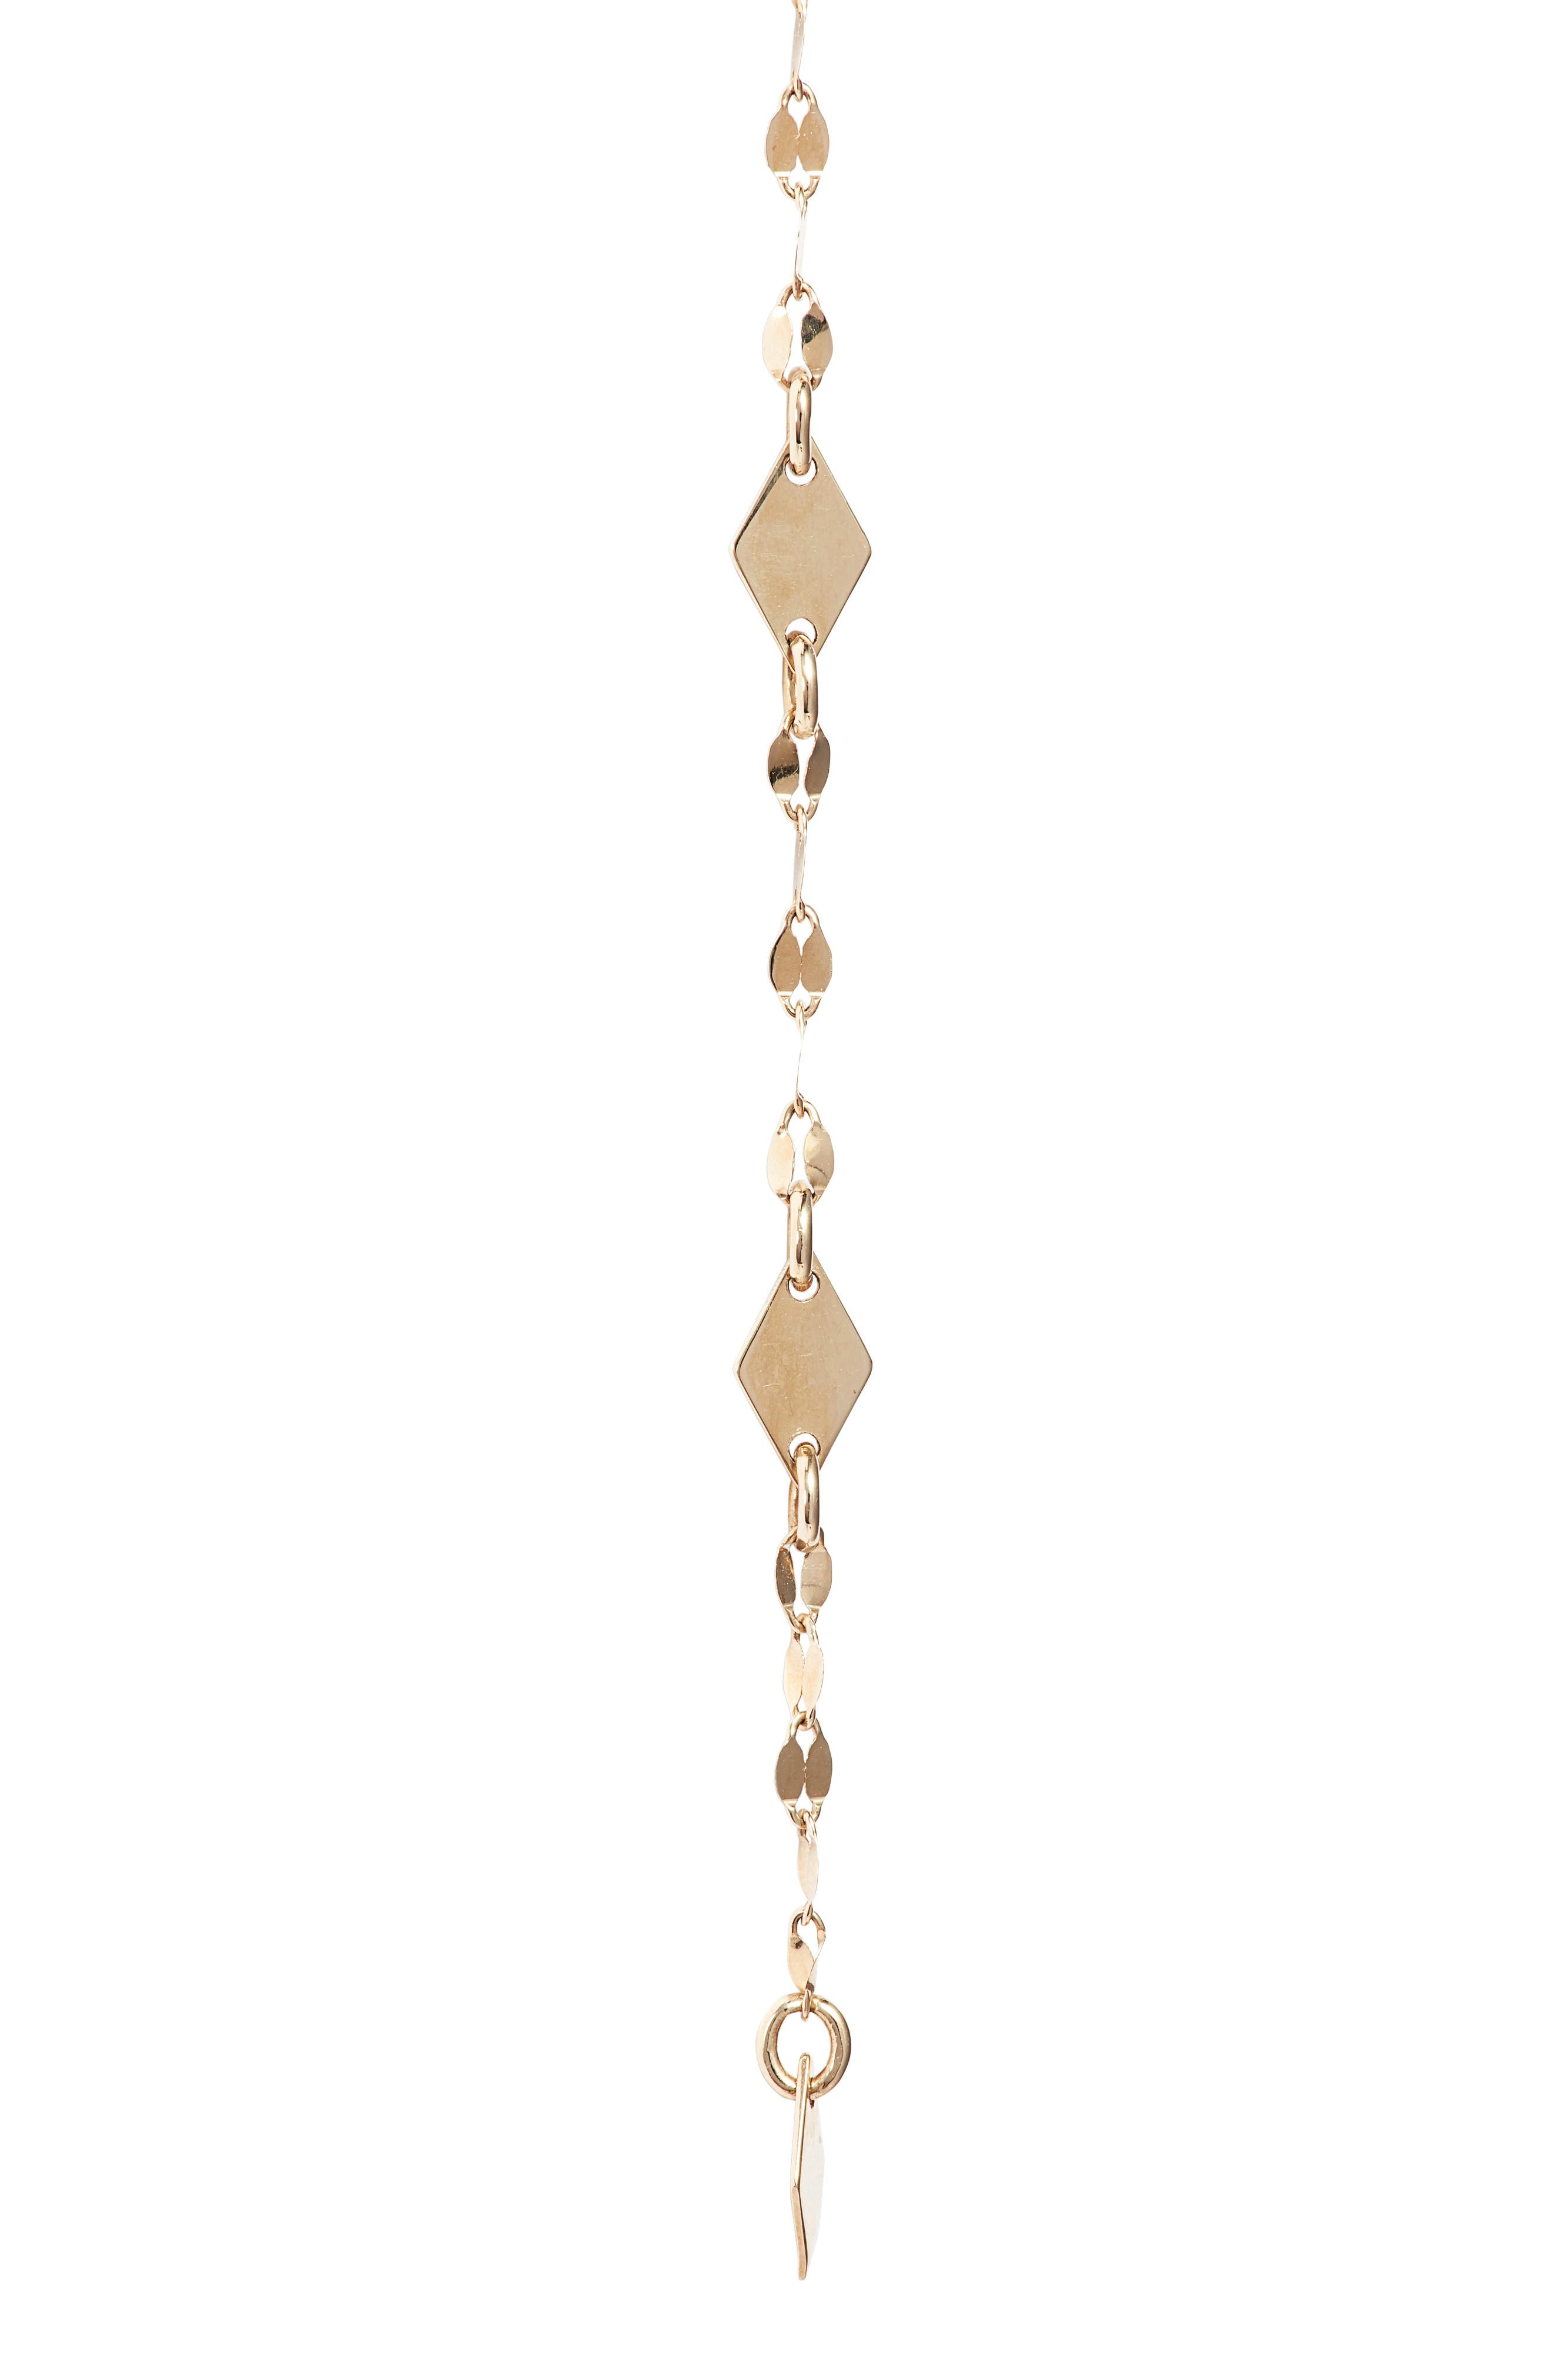 Mismatch Mini Kite Duster Earrings,                             Alternate thumbnail 5, color,                             GOLD